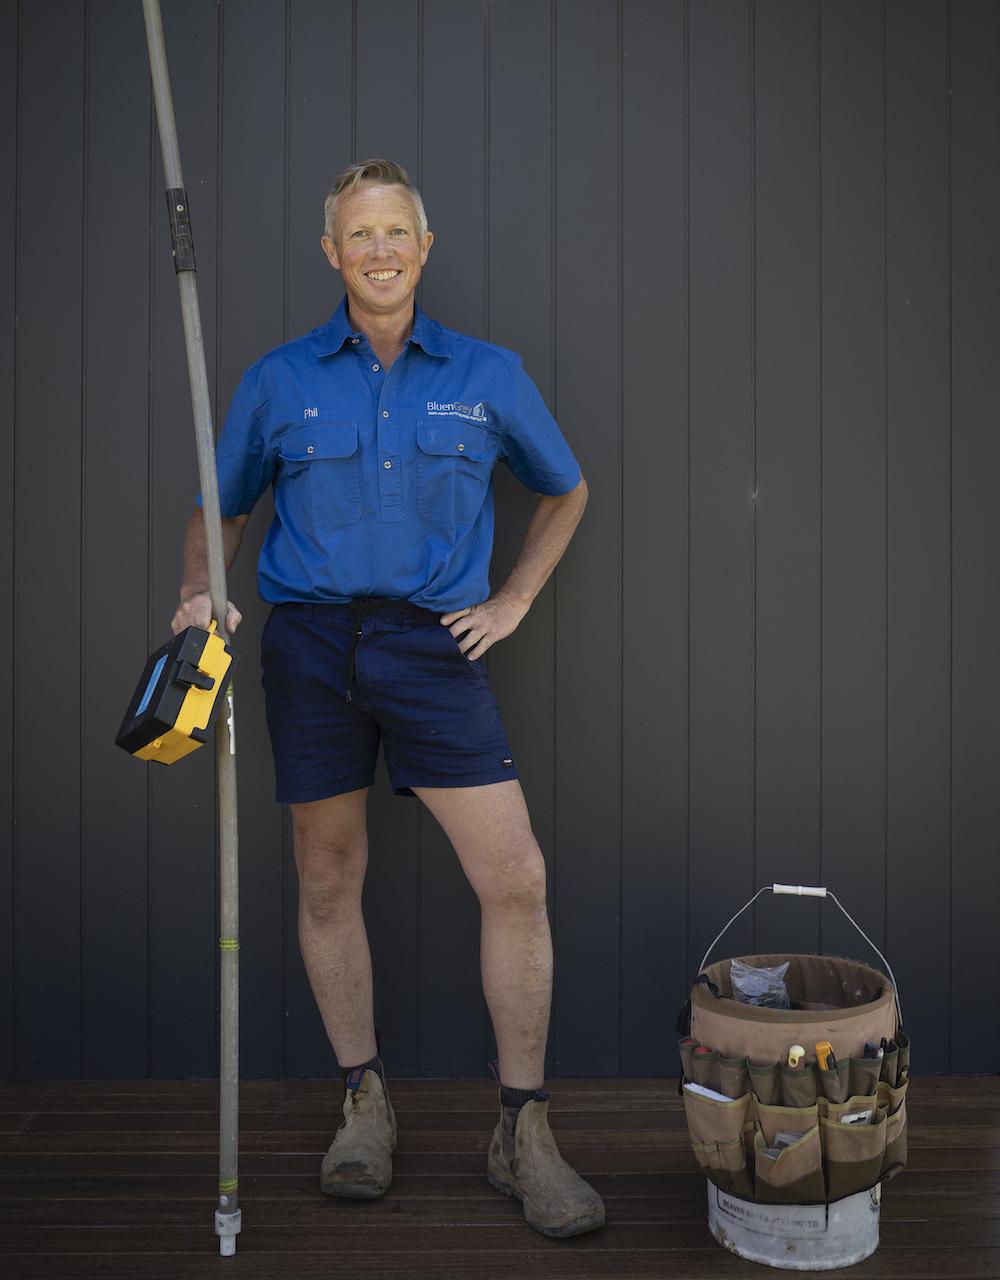 BluenGrey Expert Septic Servicing South Coast NSW